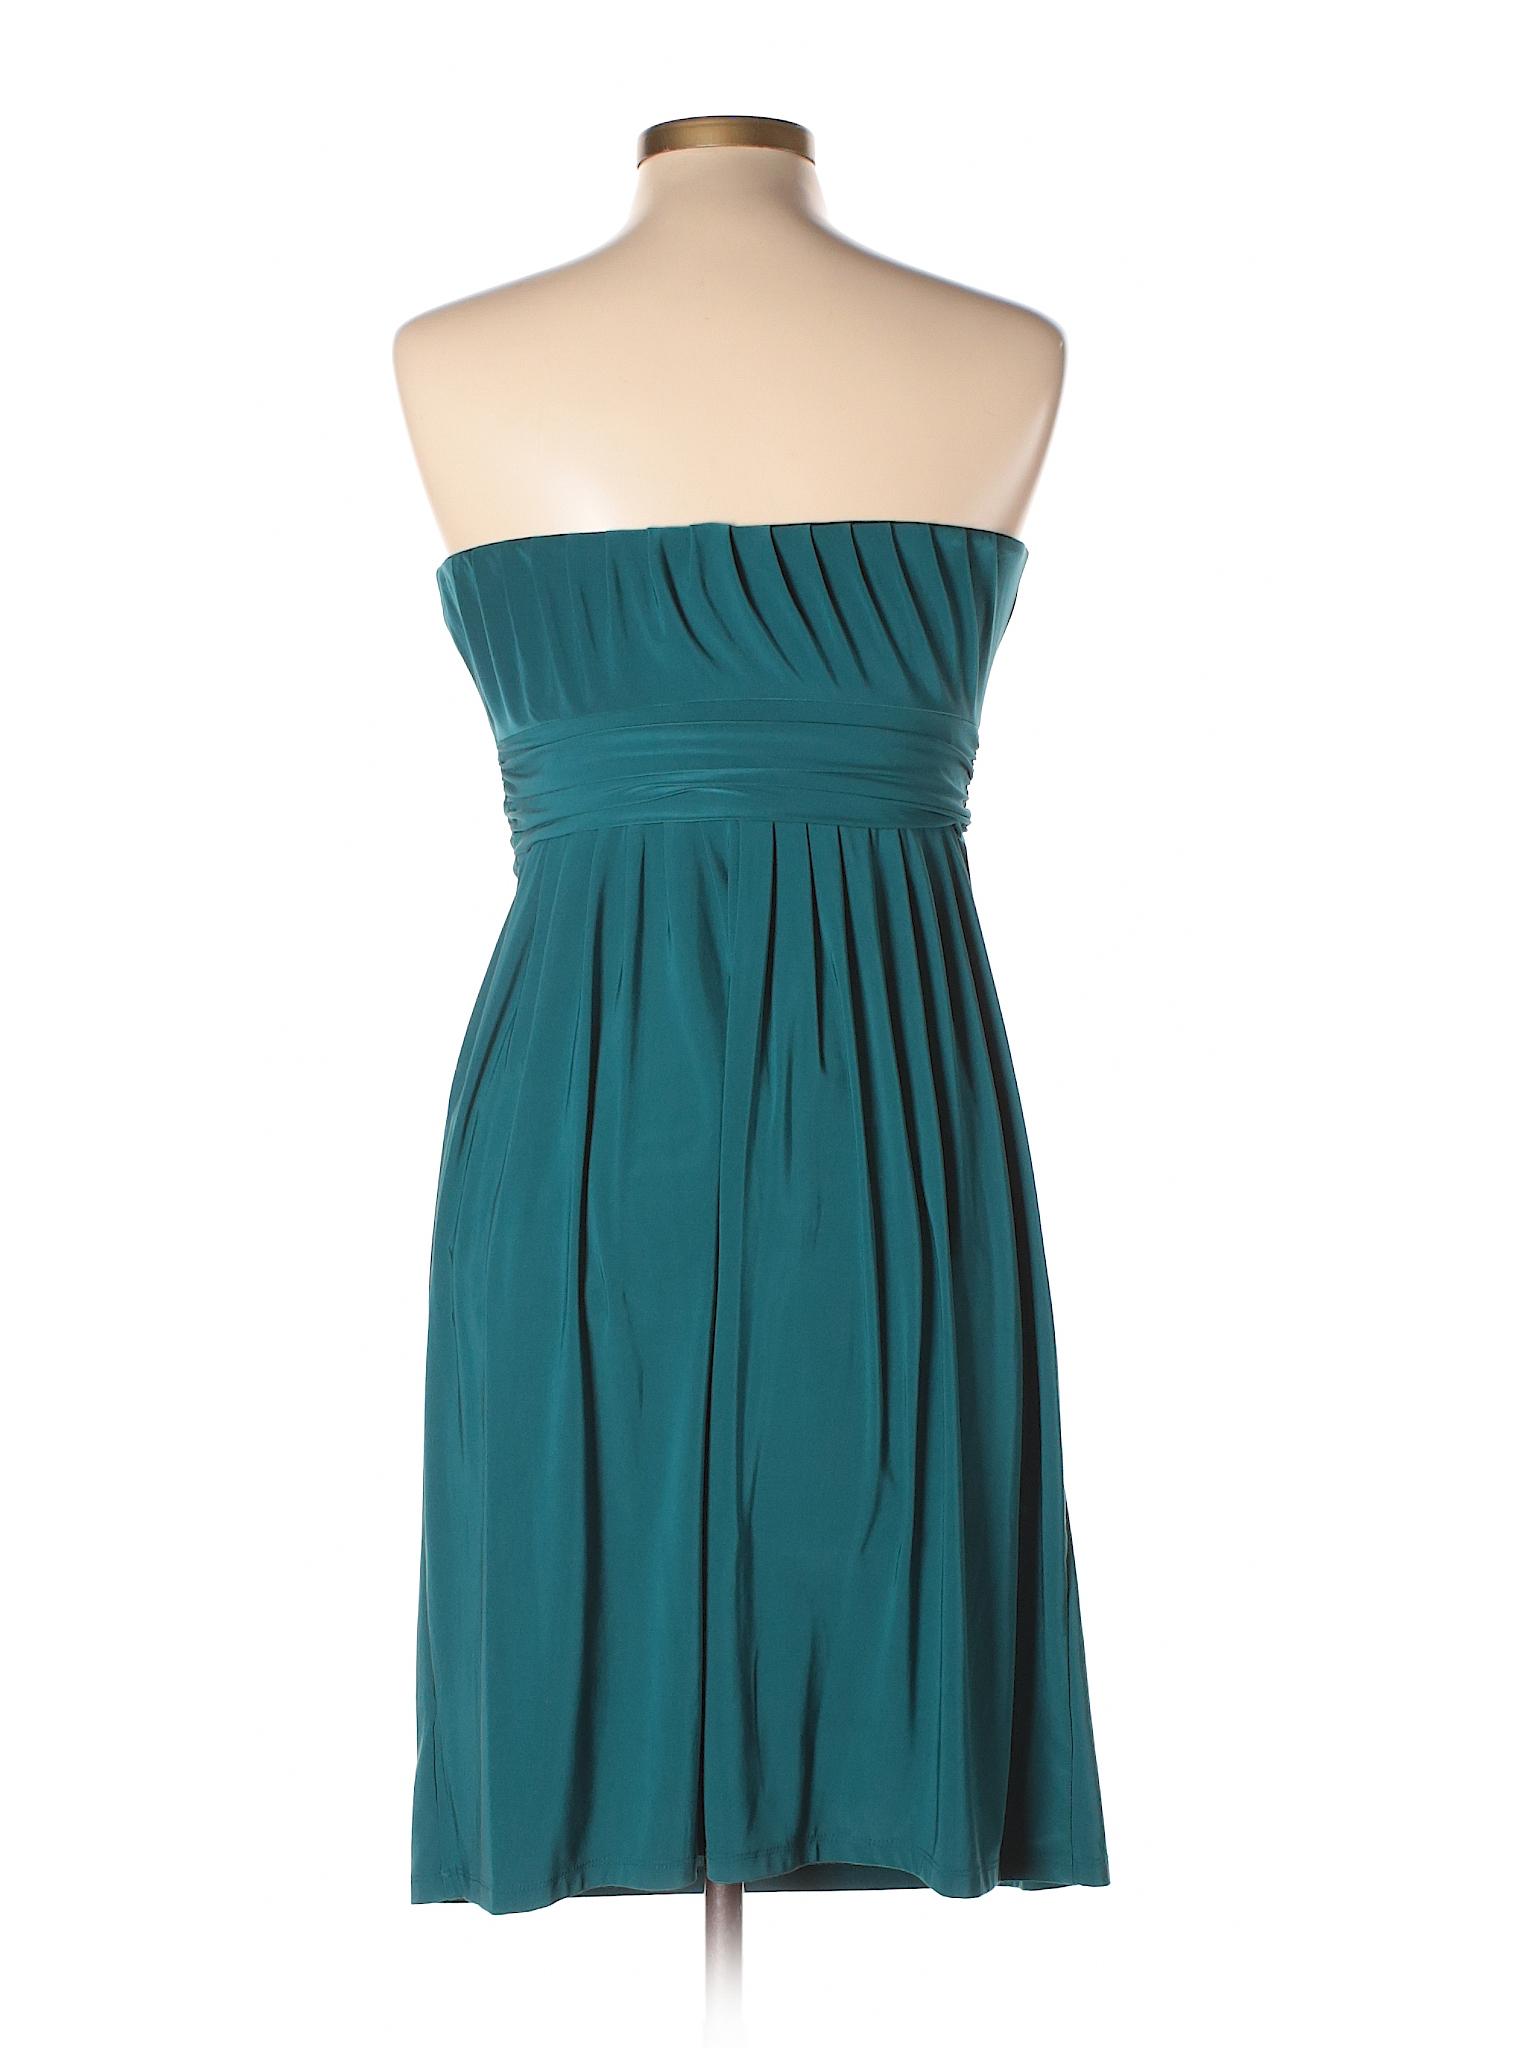 Casual Dress Limited The winter Boutique qzwSvv